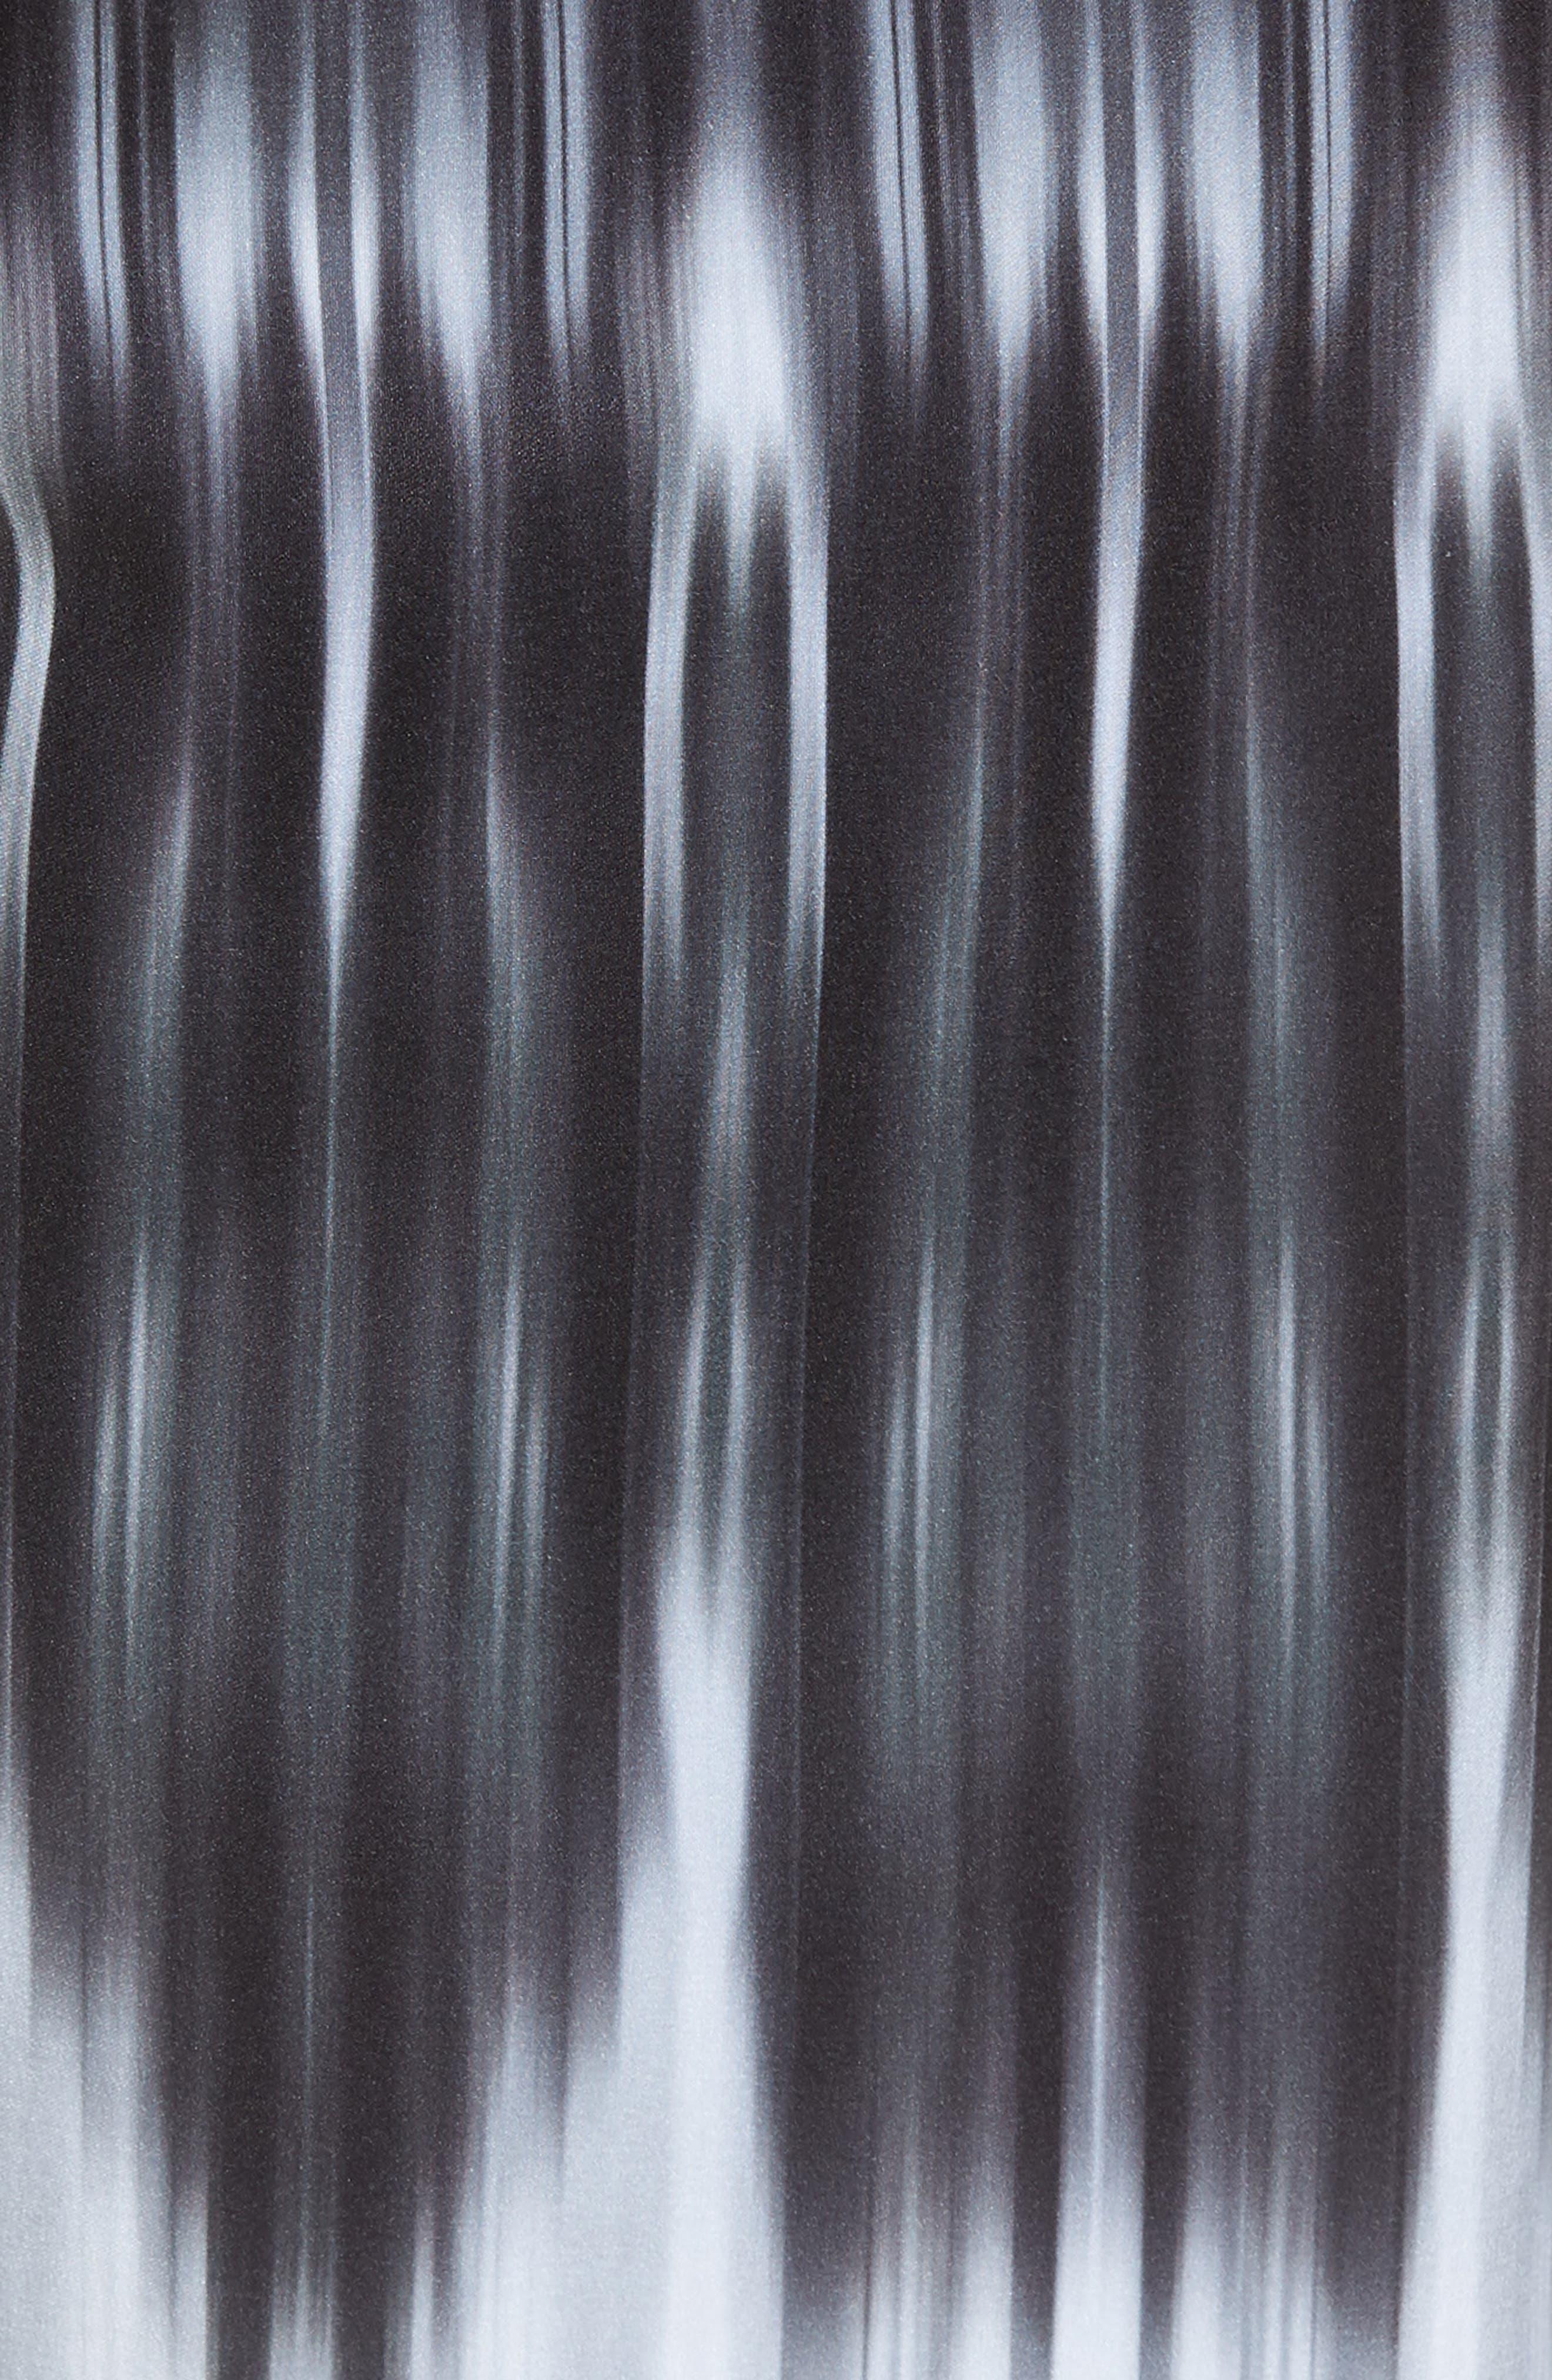 Superfreak Dimension Board Shorts,                             Alternate thumbnail 5, color,                             001